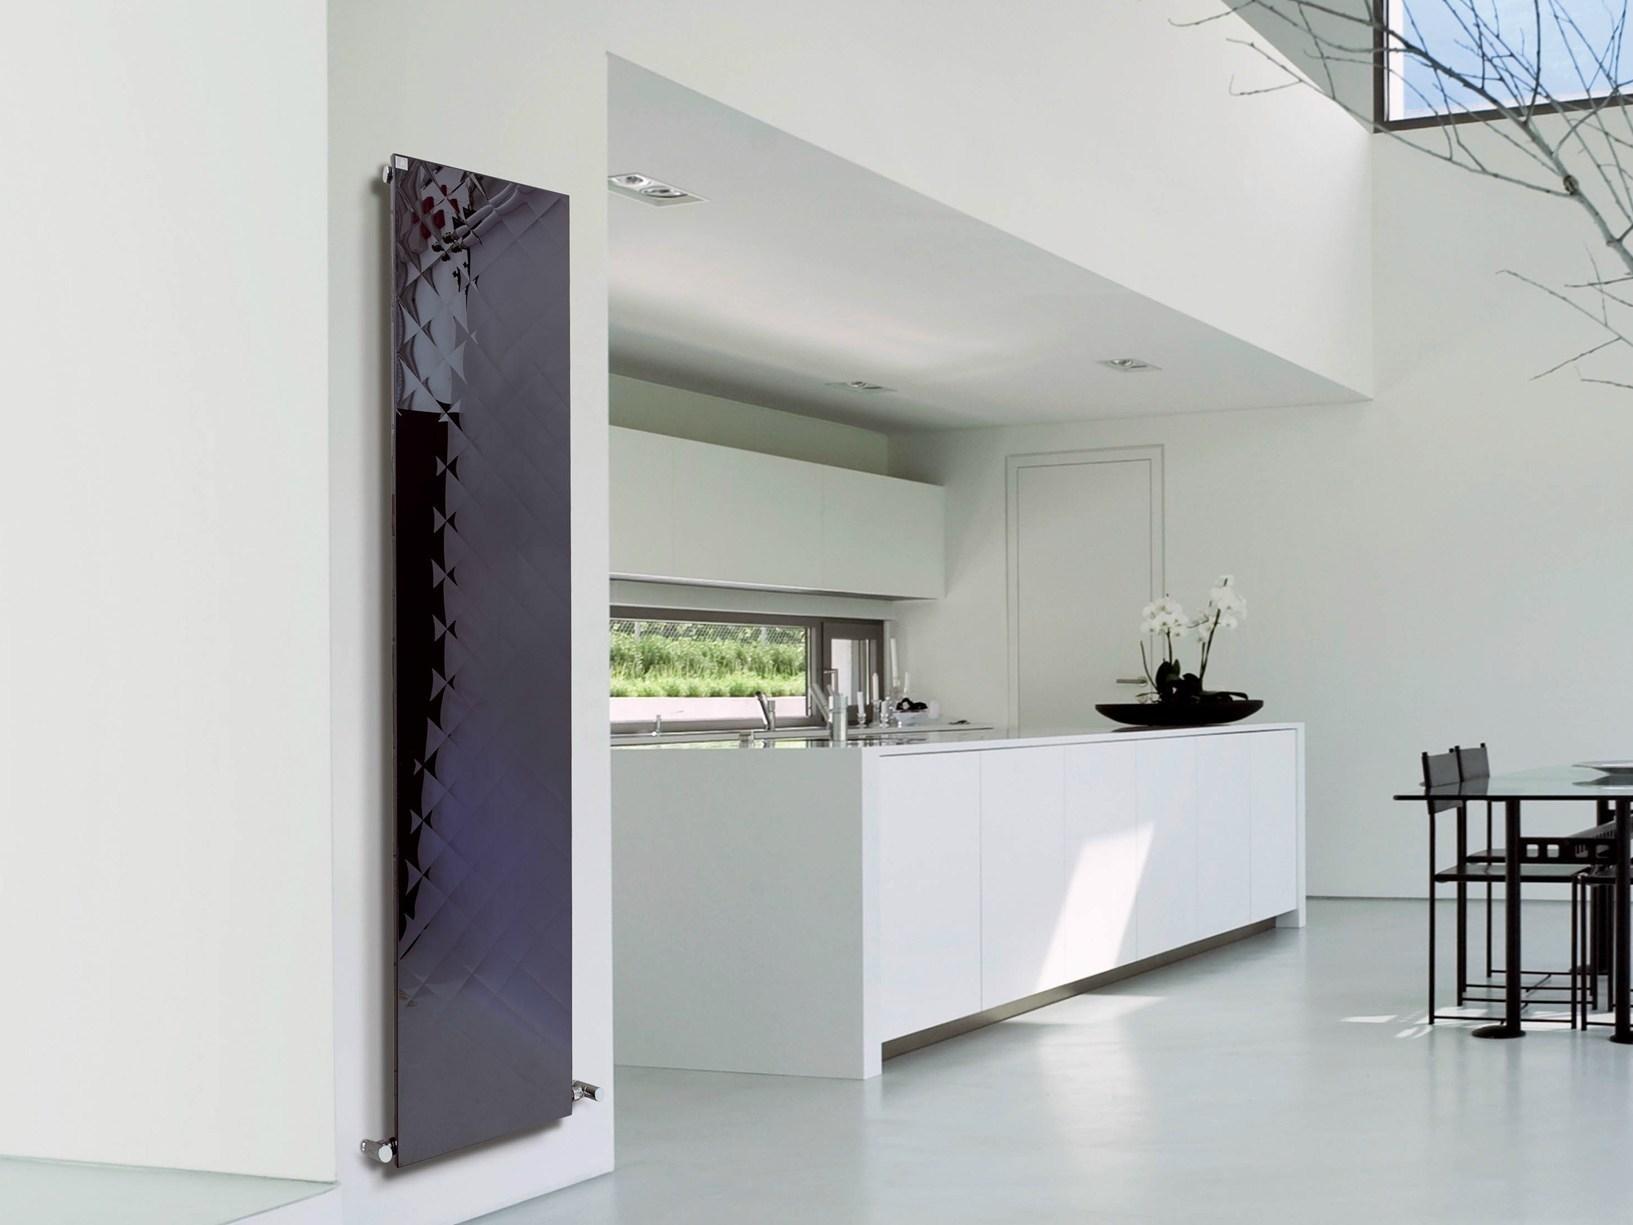 Emejing Termoarredo Per Cucina Gallery - Embercreative.us ...